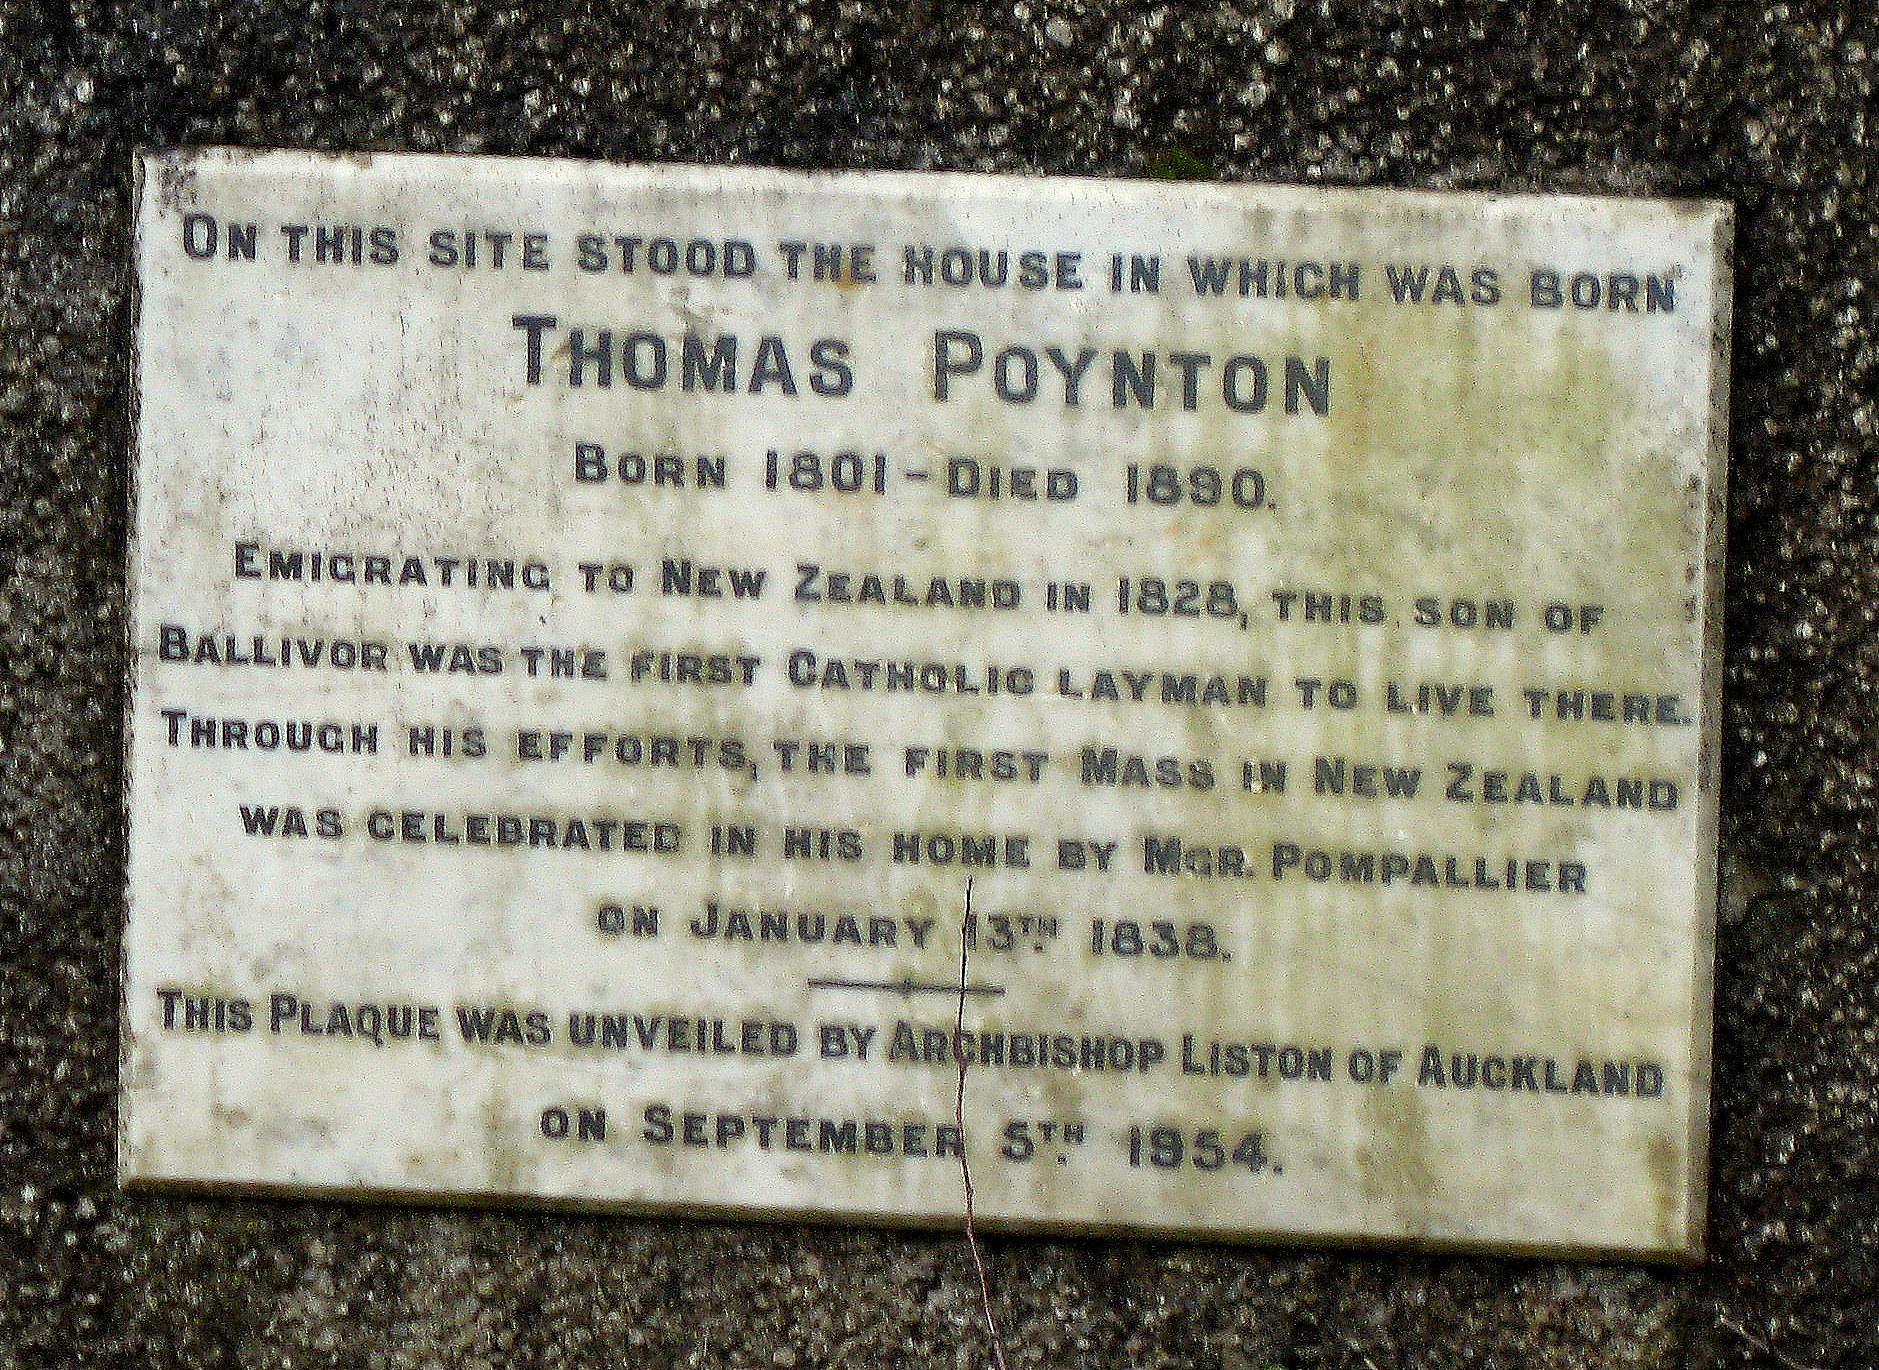 Poynton's Plaque